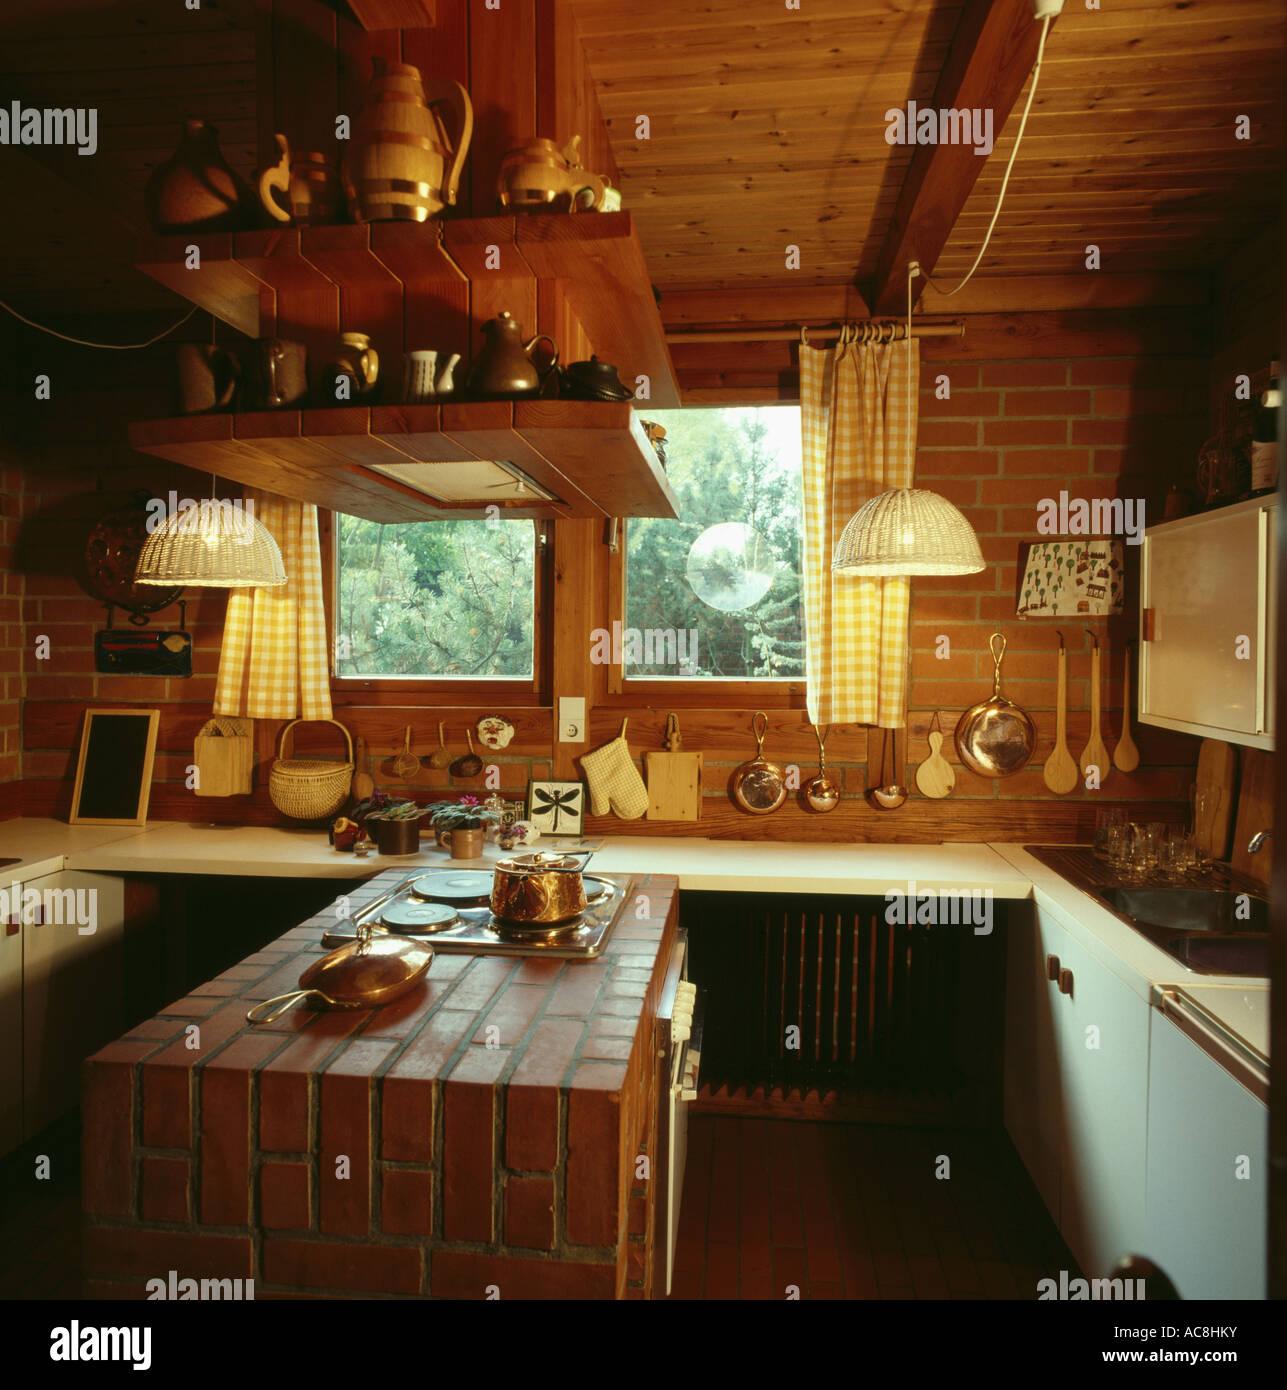 Fantástico Ideas Creativas Para Techos De Cocina Fotos - Como ...